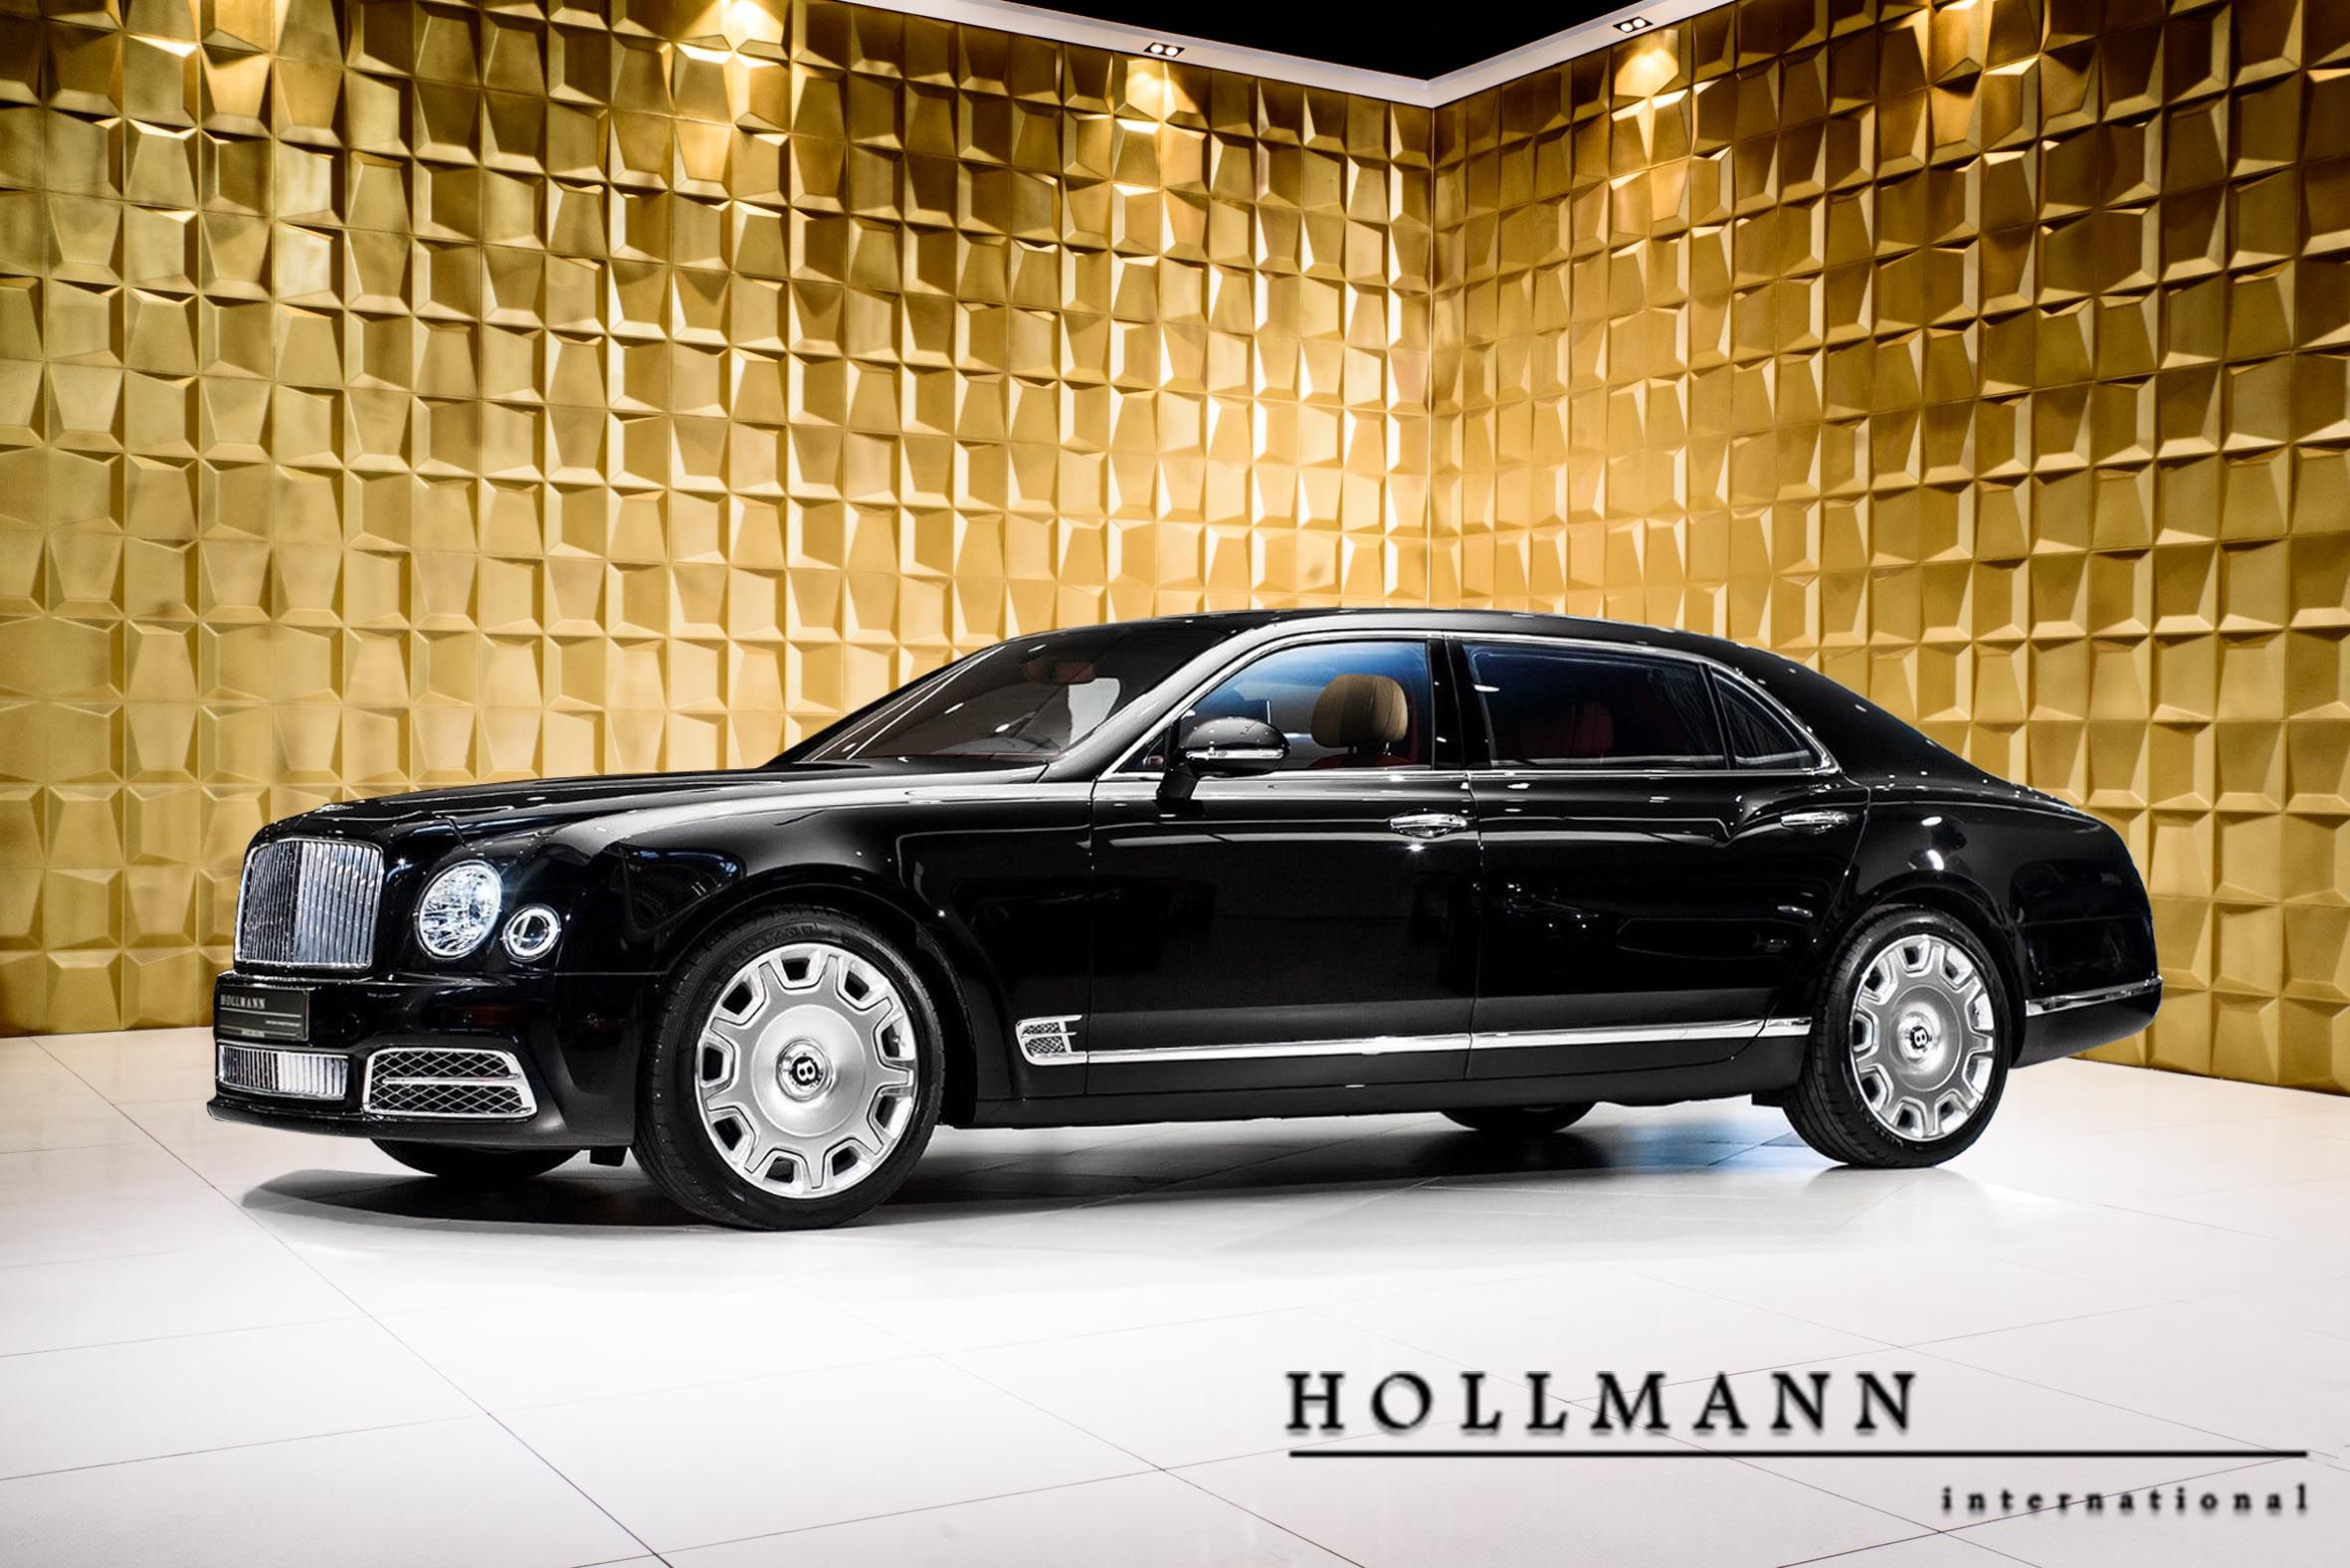 Bentley Mulsanne Ewb My2019 Luxury Pulse Cars Germany For Sale On Luxurypulse Bentley Mulsanne Top Luxury Cars Bentley